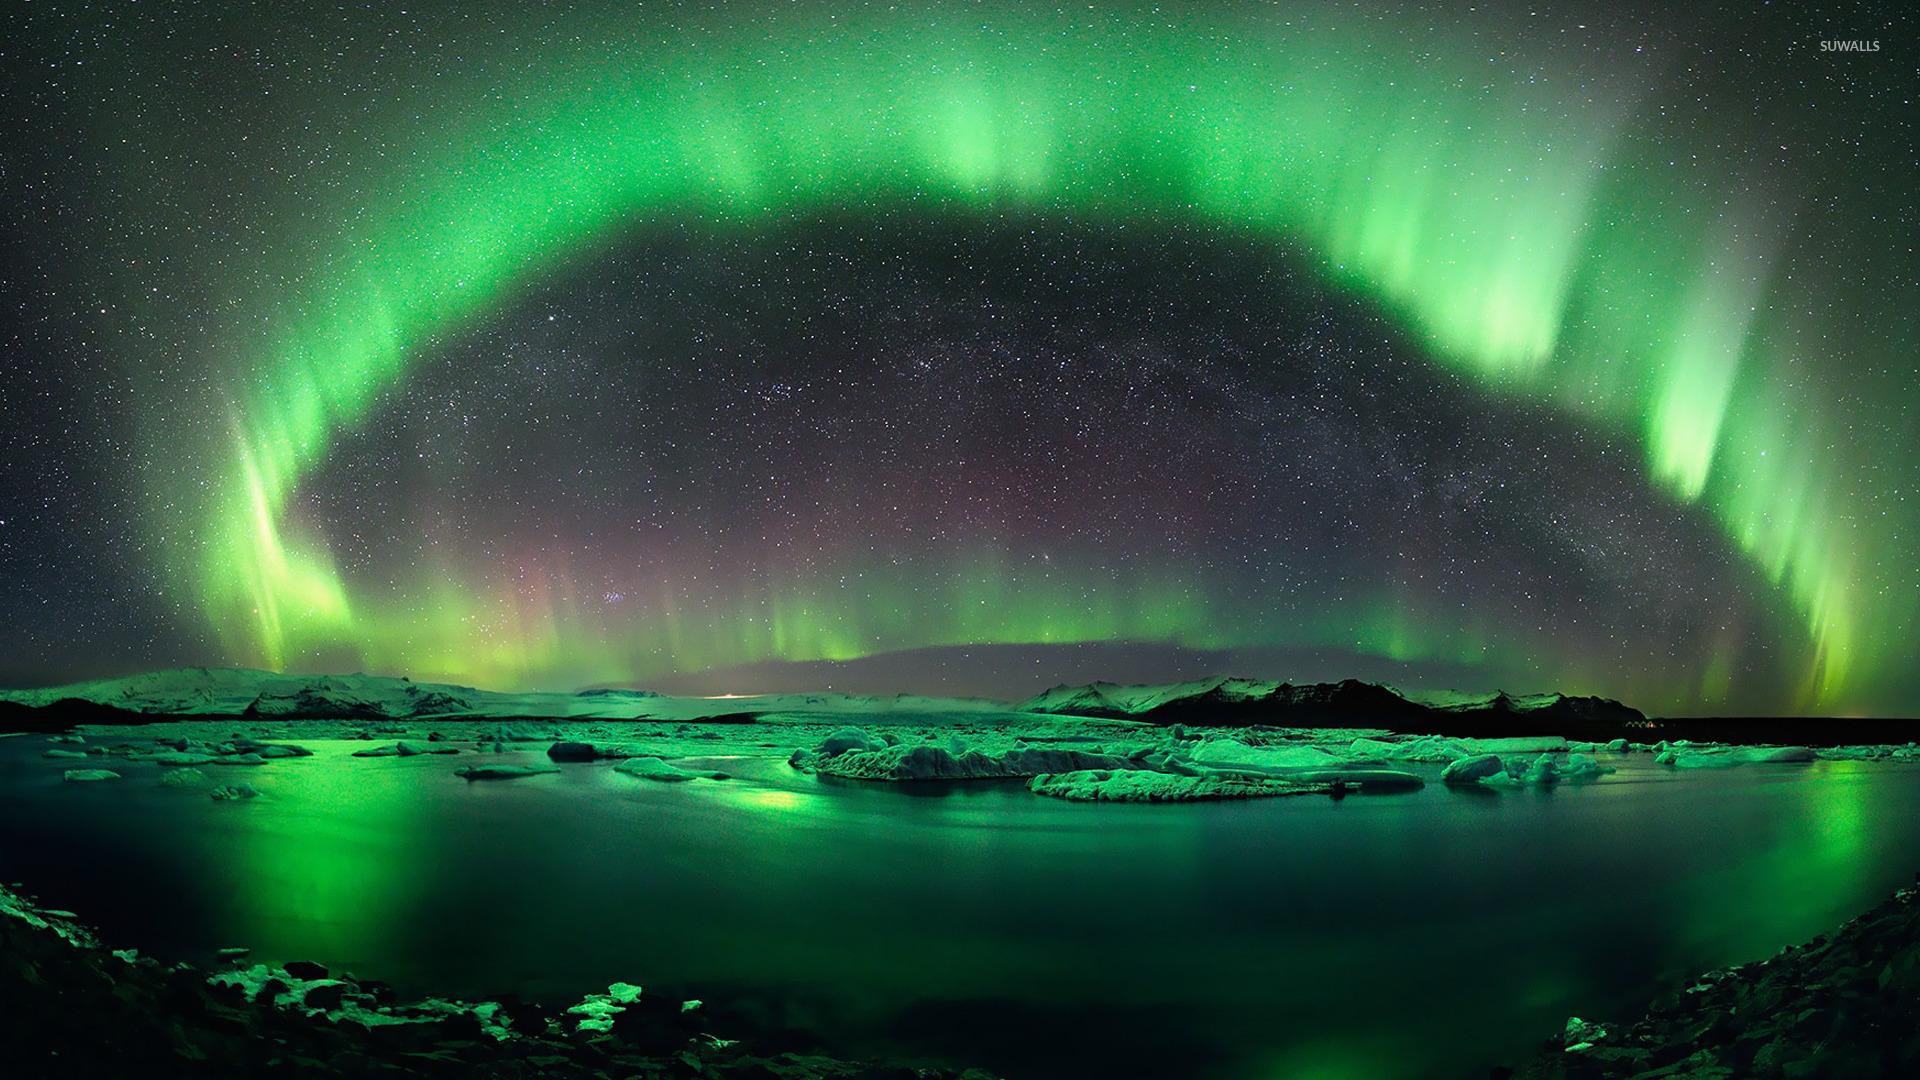 Aurora borealis wallpaper - Nature wallpapers - #14246